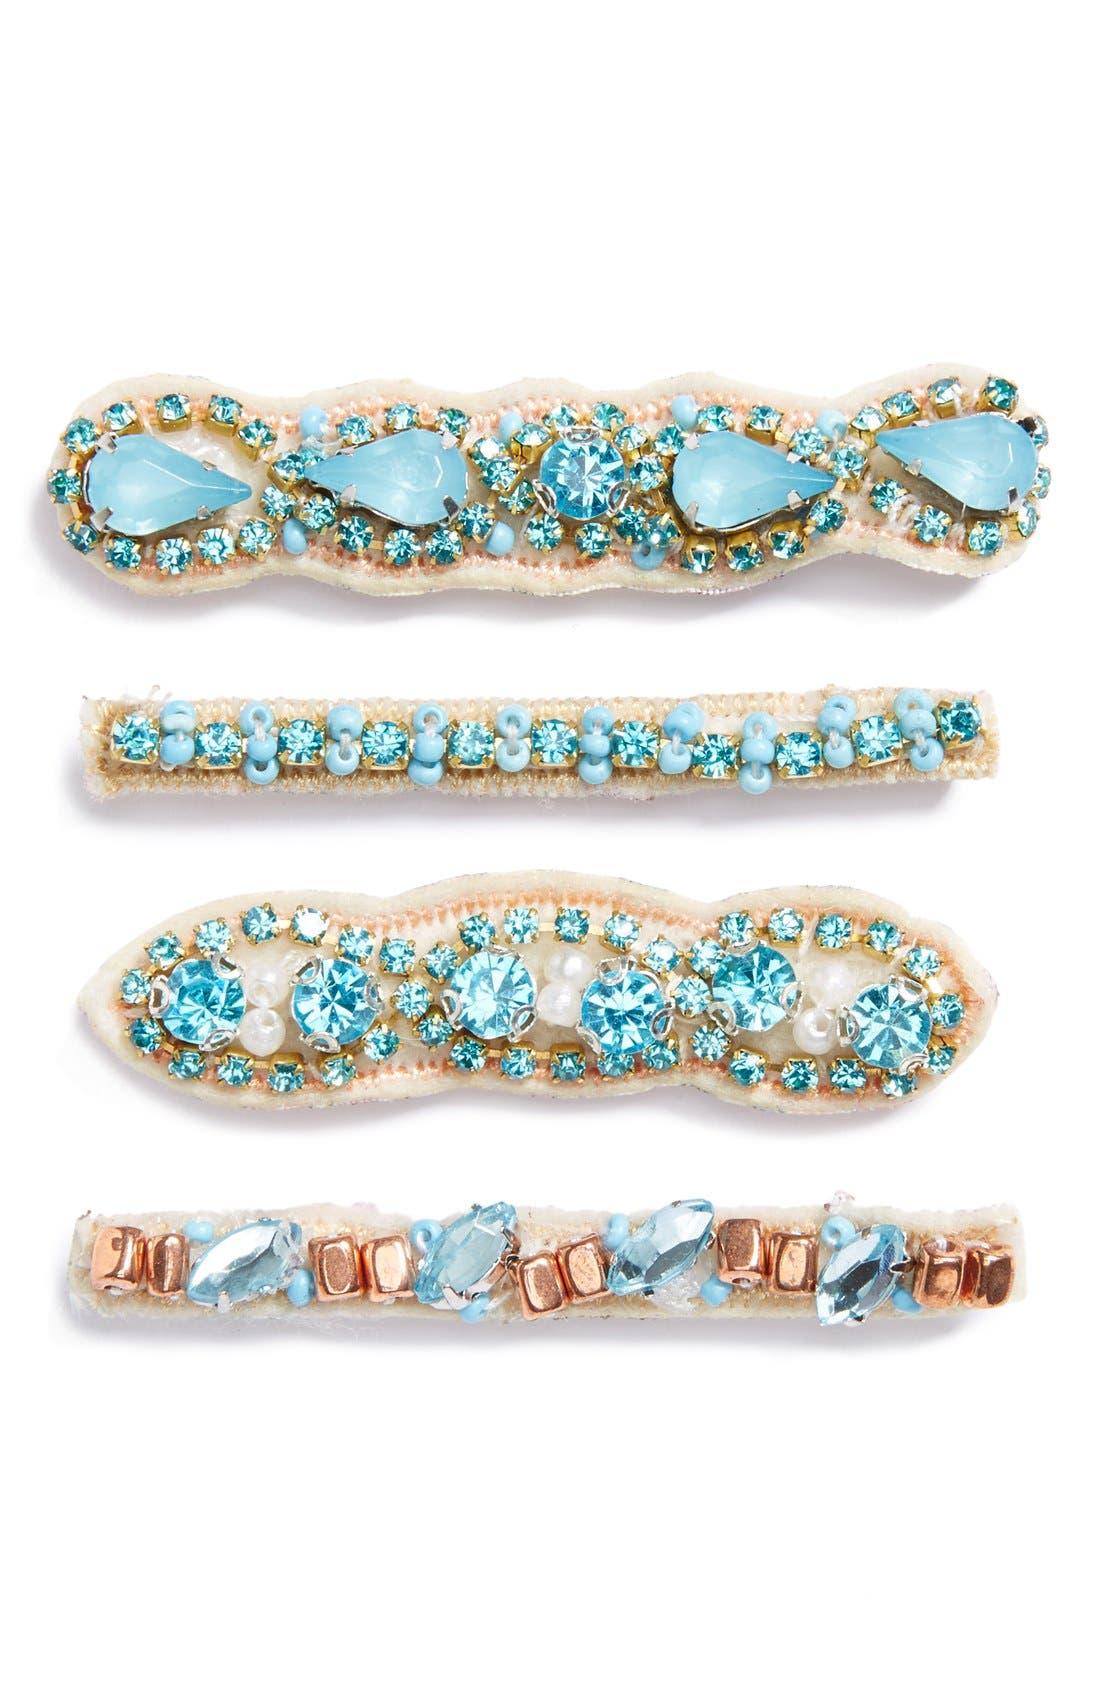 Main Image - Tasha Jeweled Bobby Pins (4-Pack)